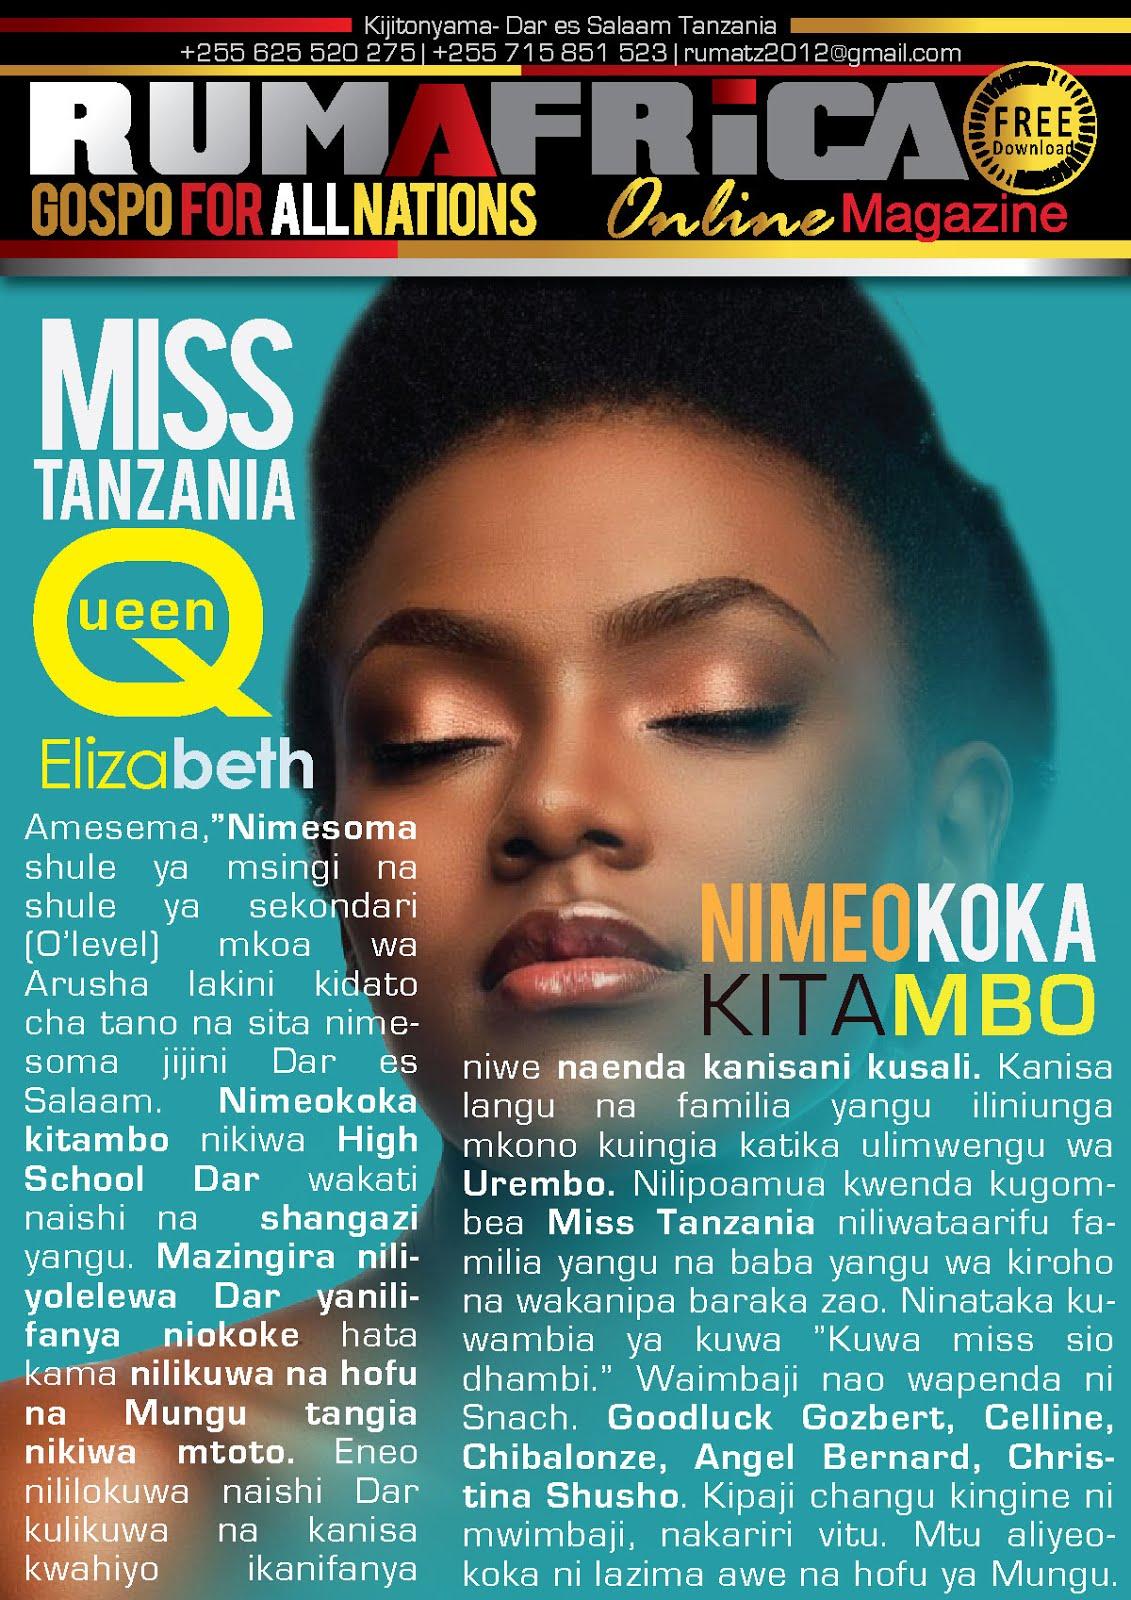 MISS TANZANIA ELIZABETH